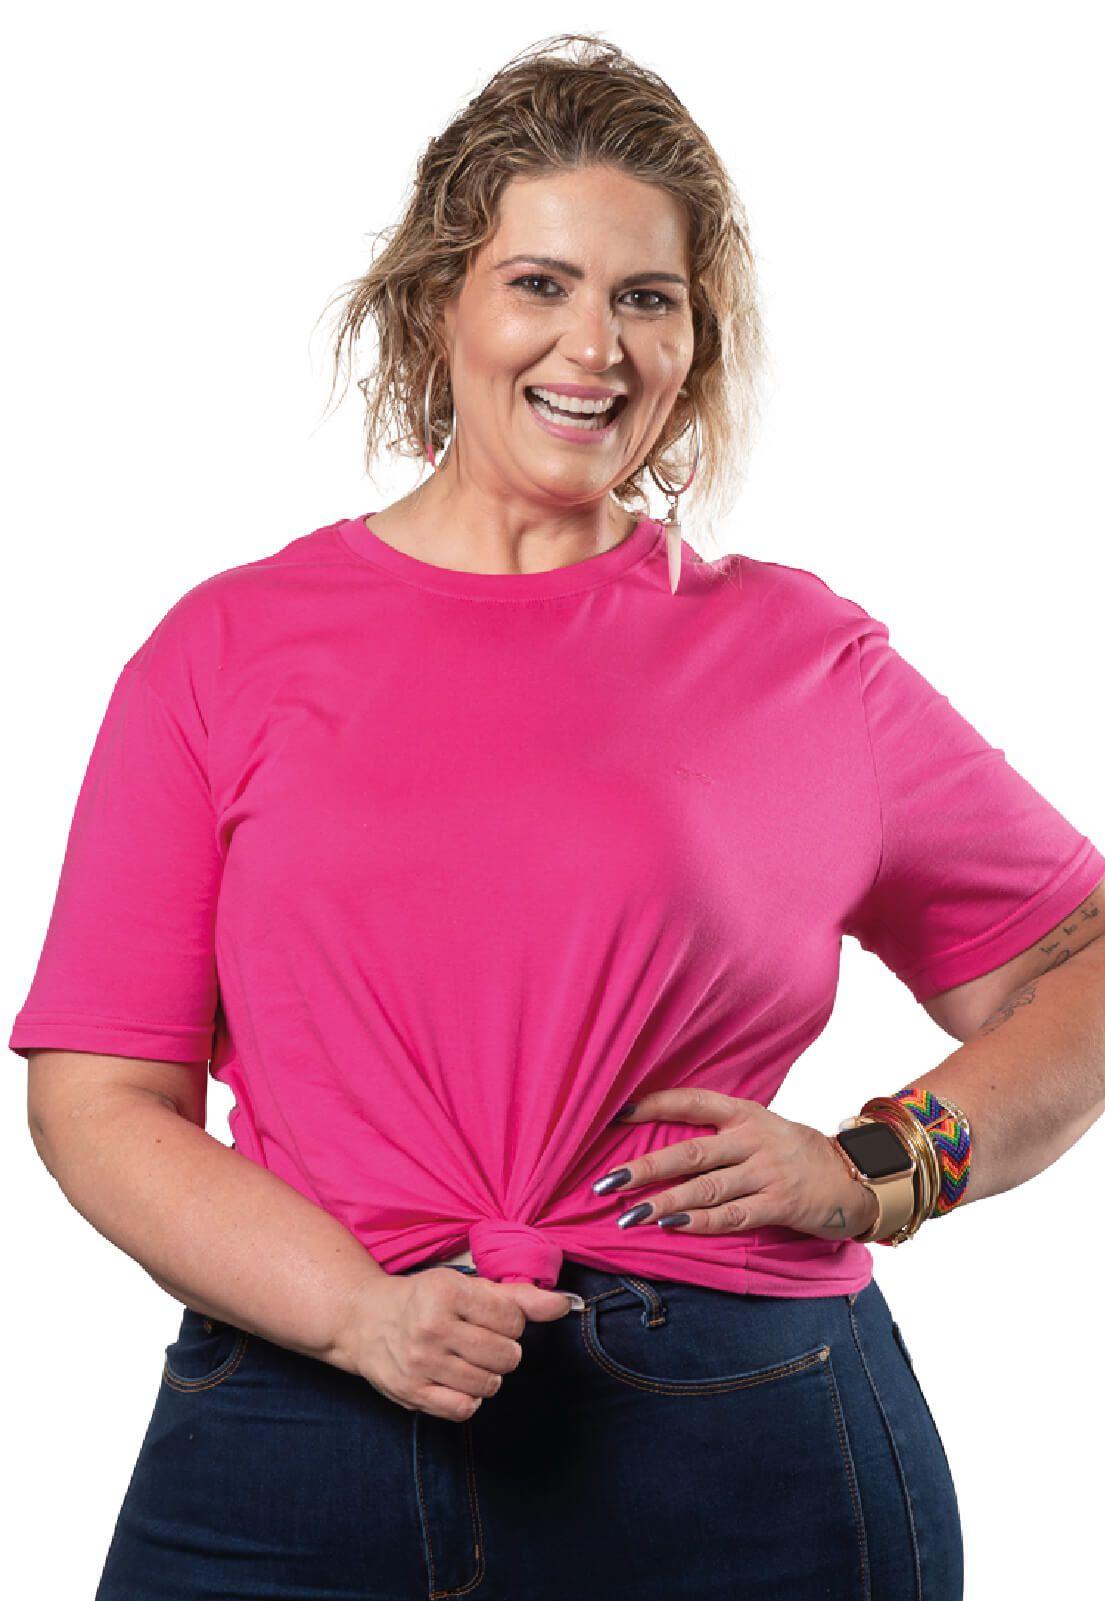 Camiseta Feminina 100% Algodão Super Premium, Na Cor Rosa